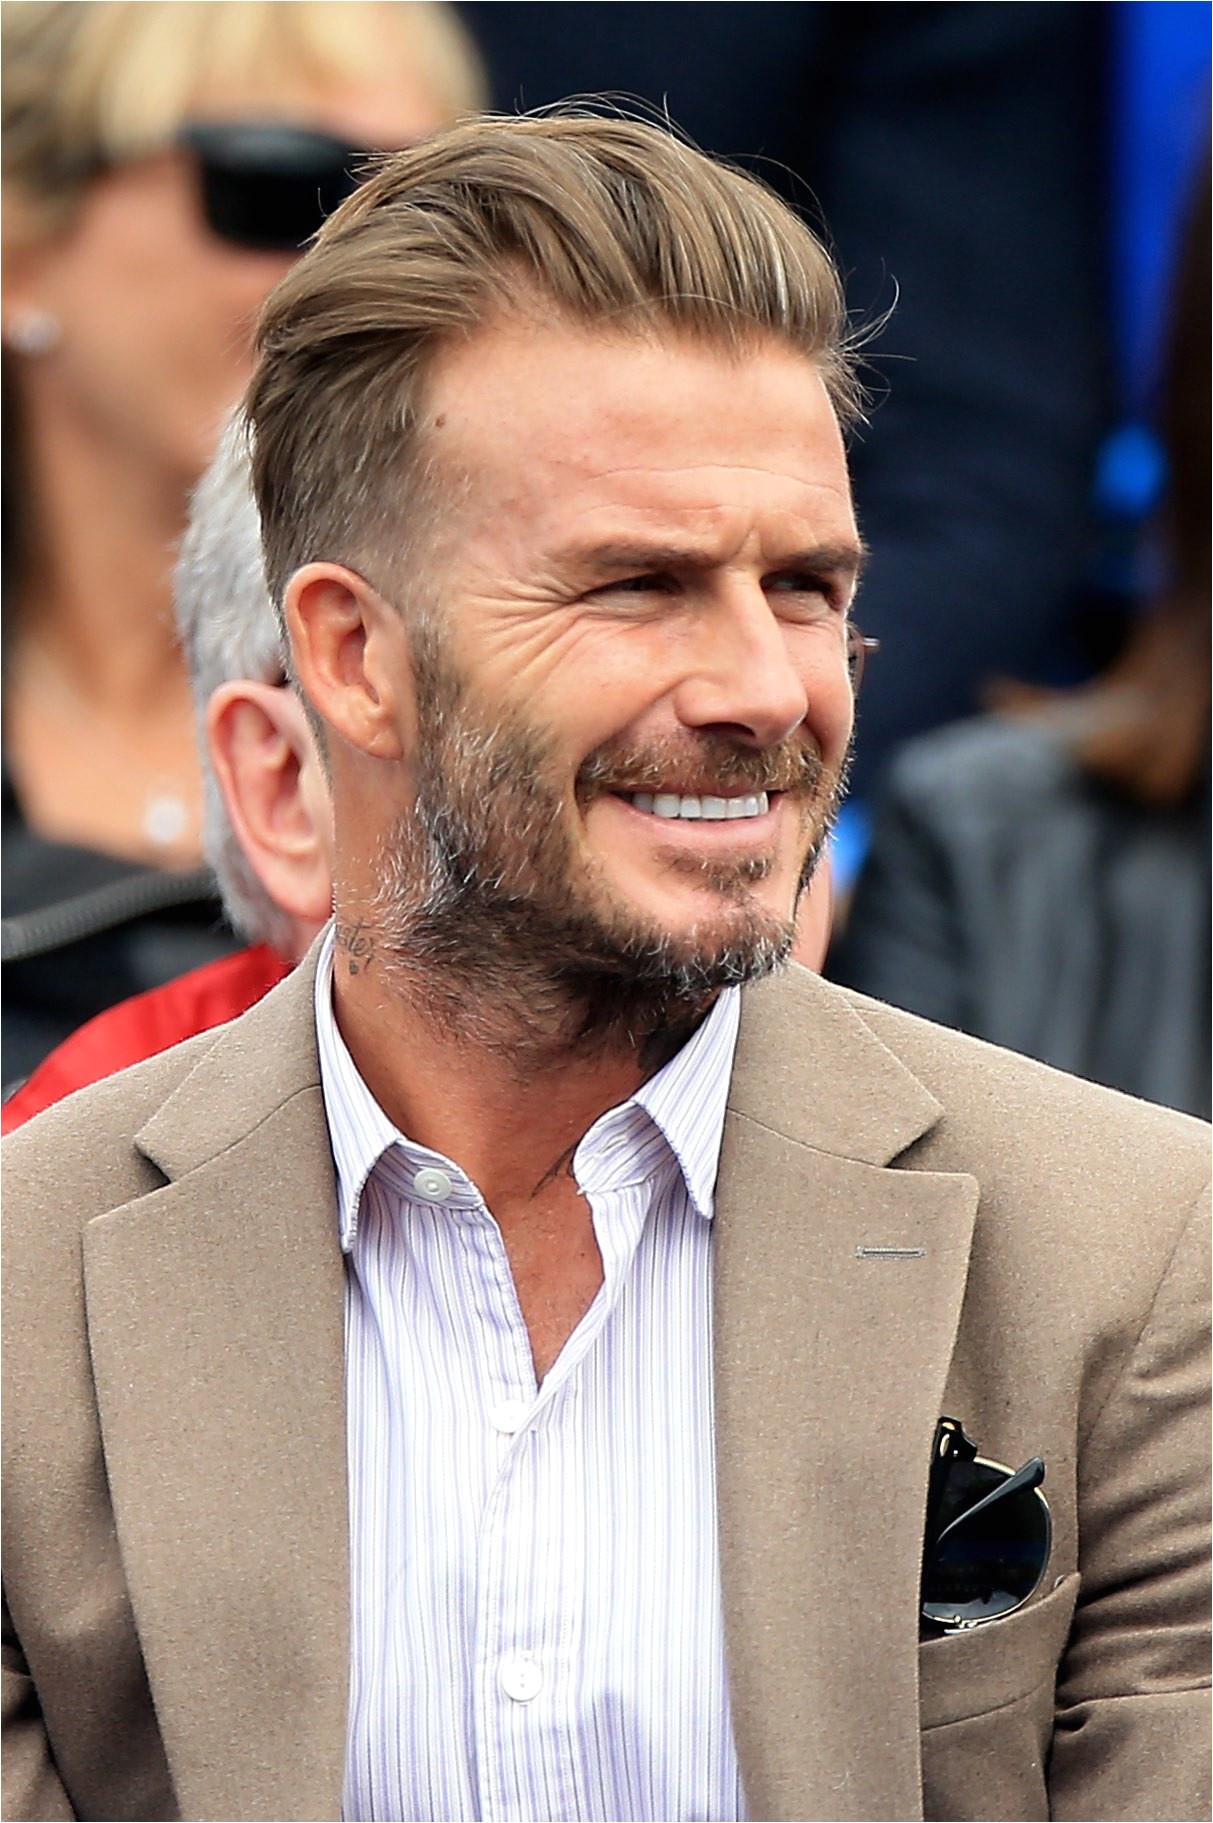 gq david beckham beard grooming 0614 jpg